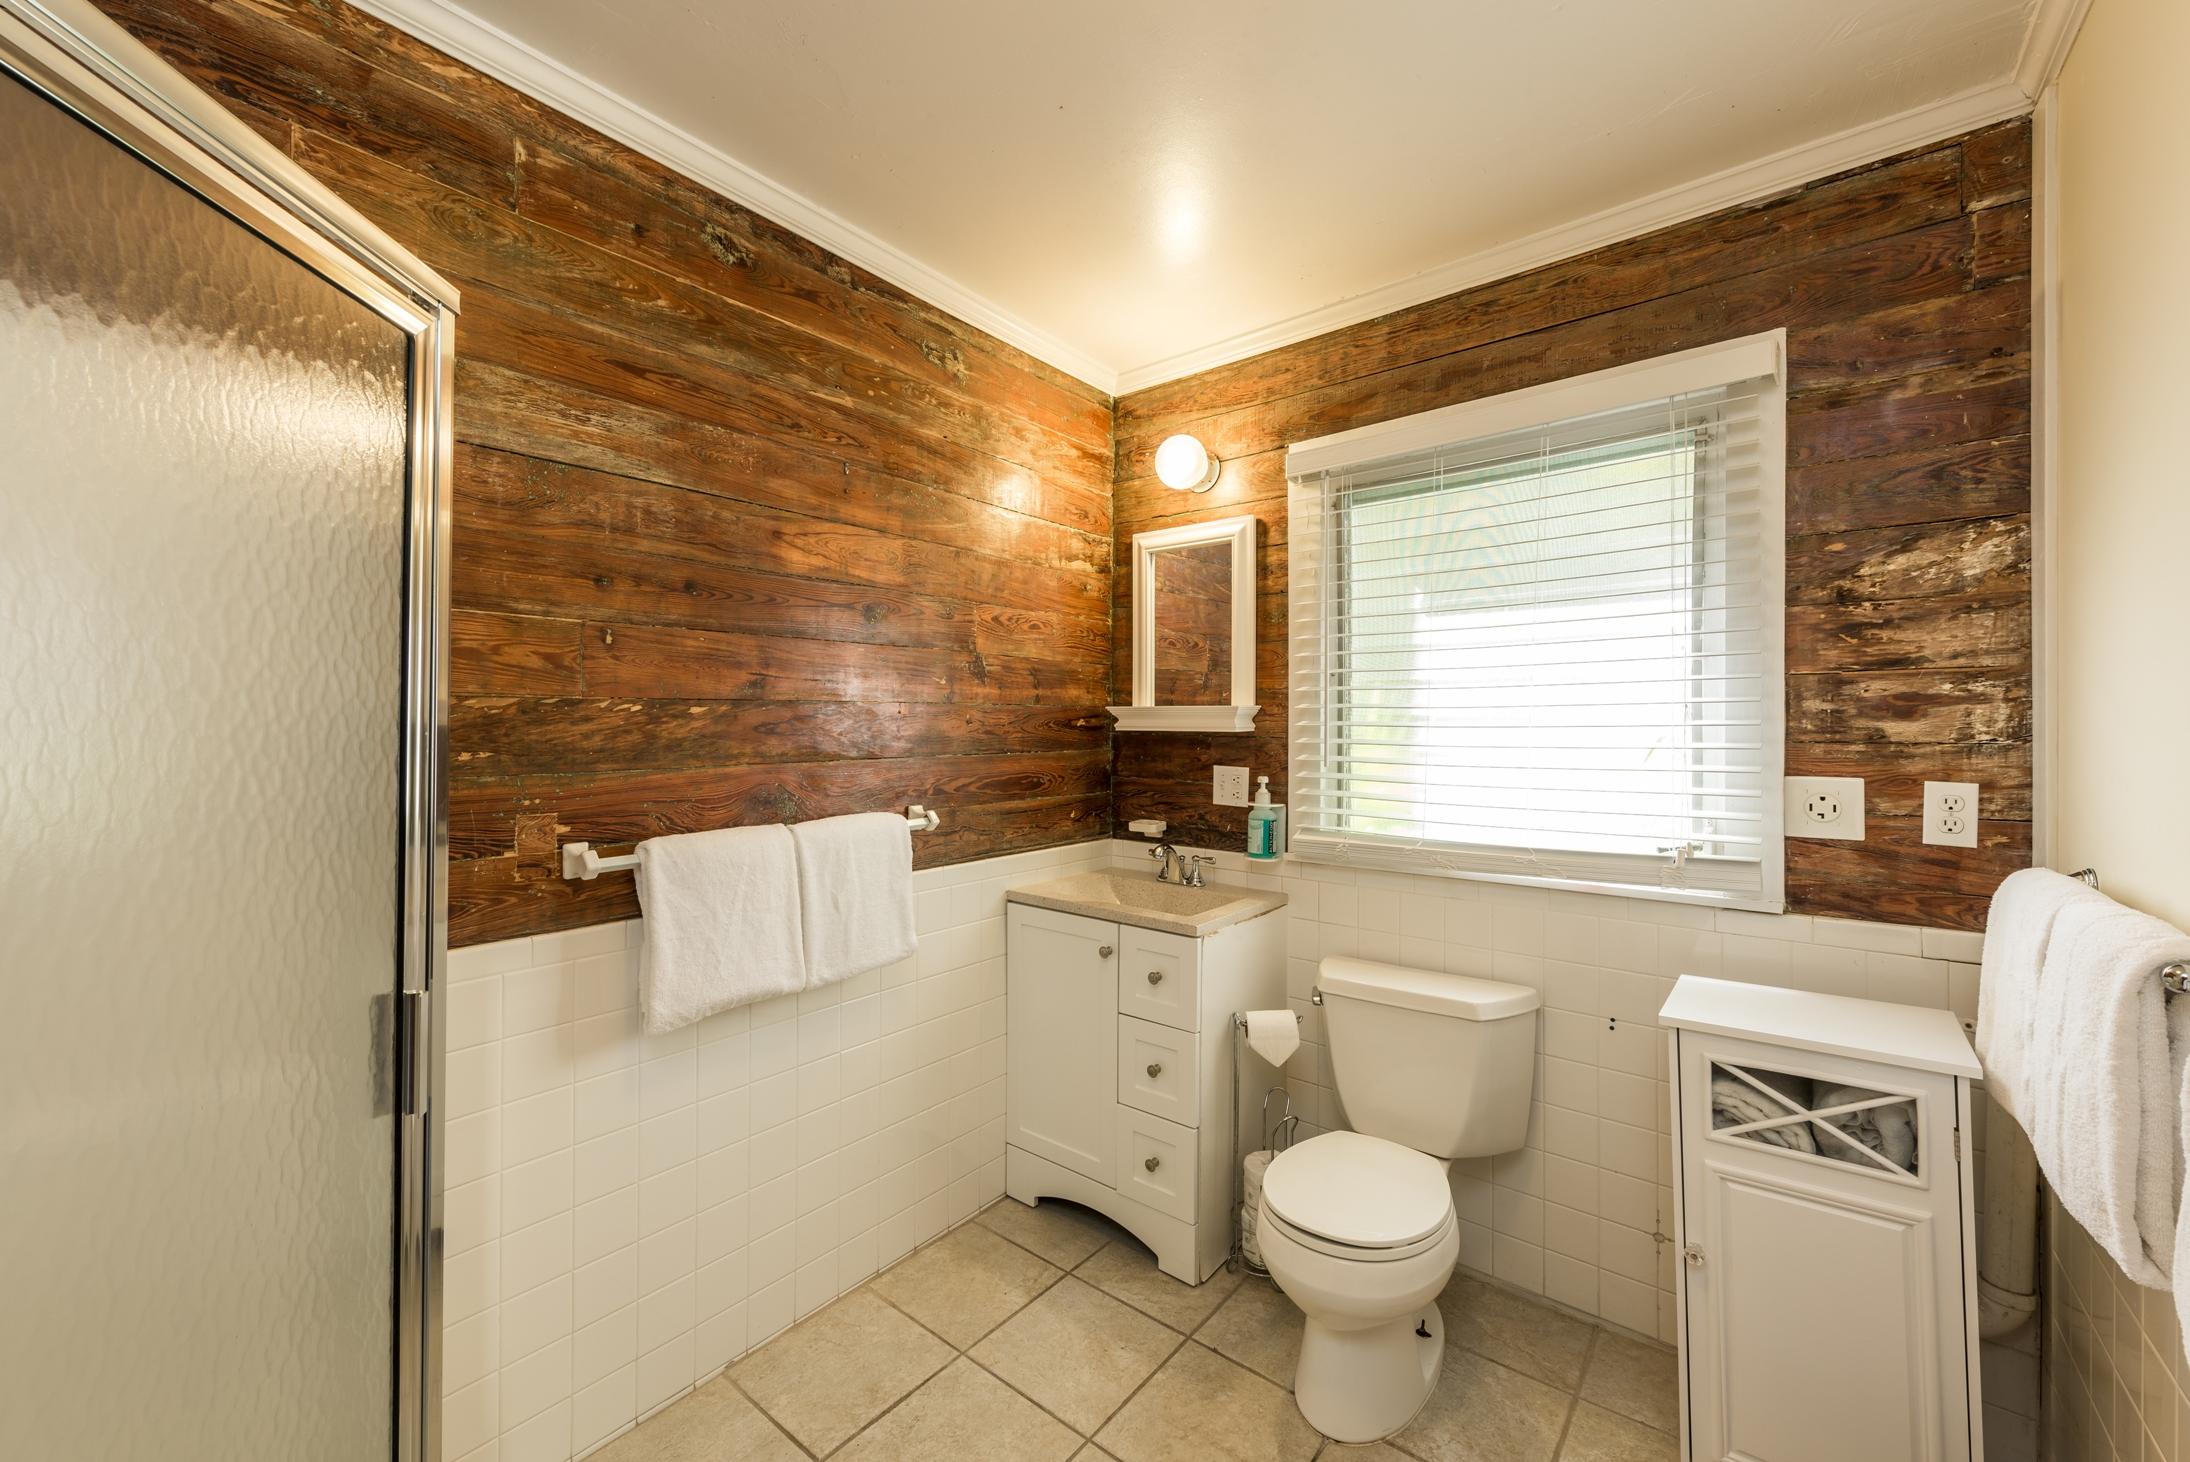 Key West Vacation Home - William Skelton House - Cottage Bathroom